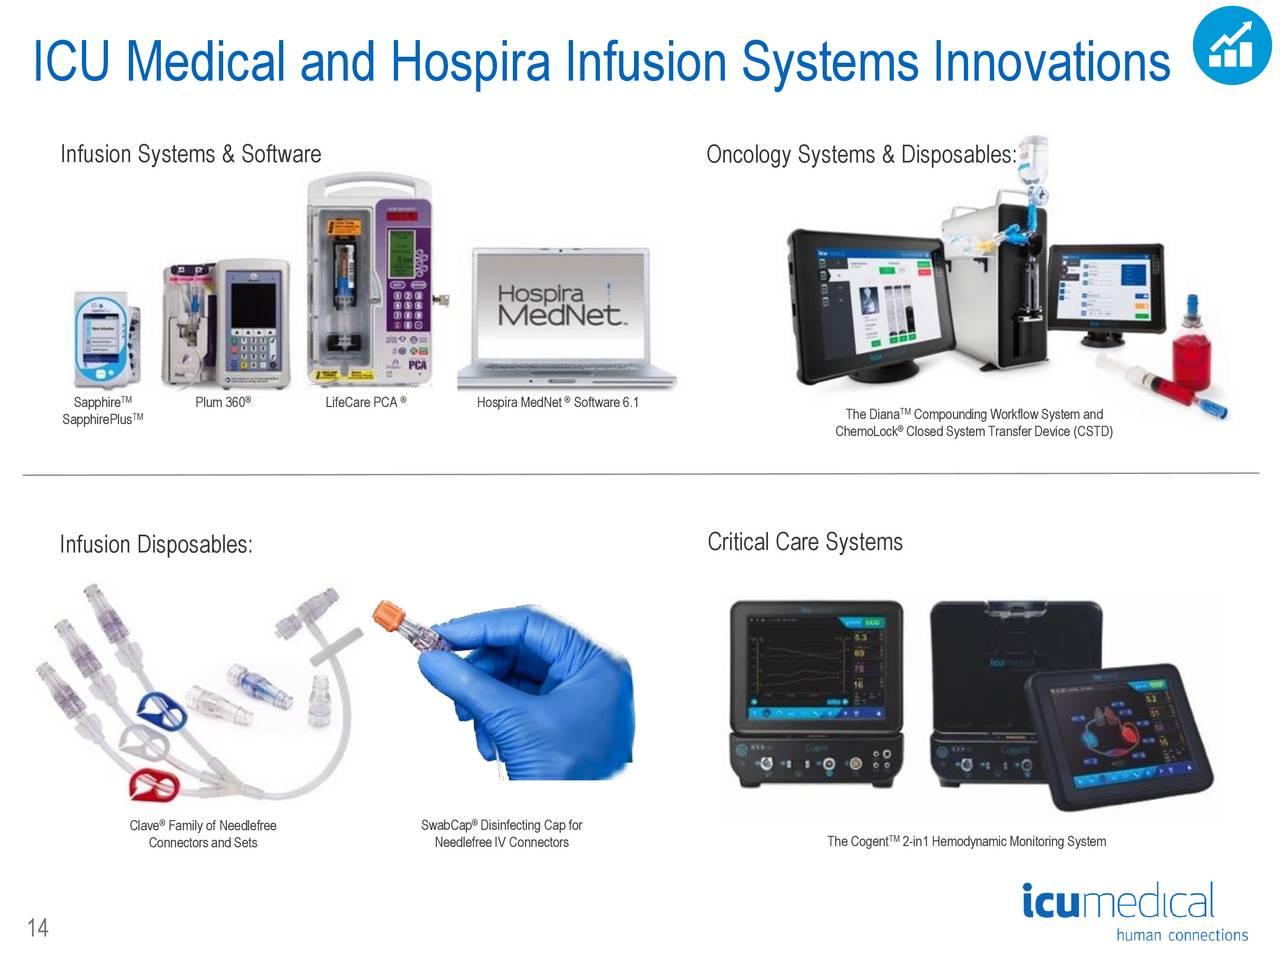 icu medical This swot analysis features 9 companies, including hospira inc, equashield llc, carefusion corp, navilyst medical inc, b braun medical inc.